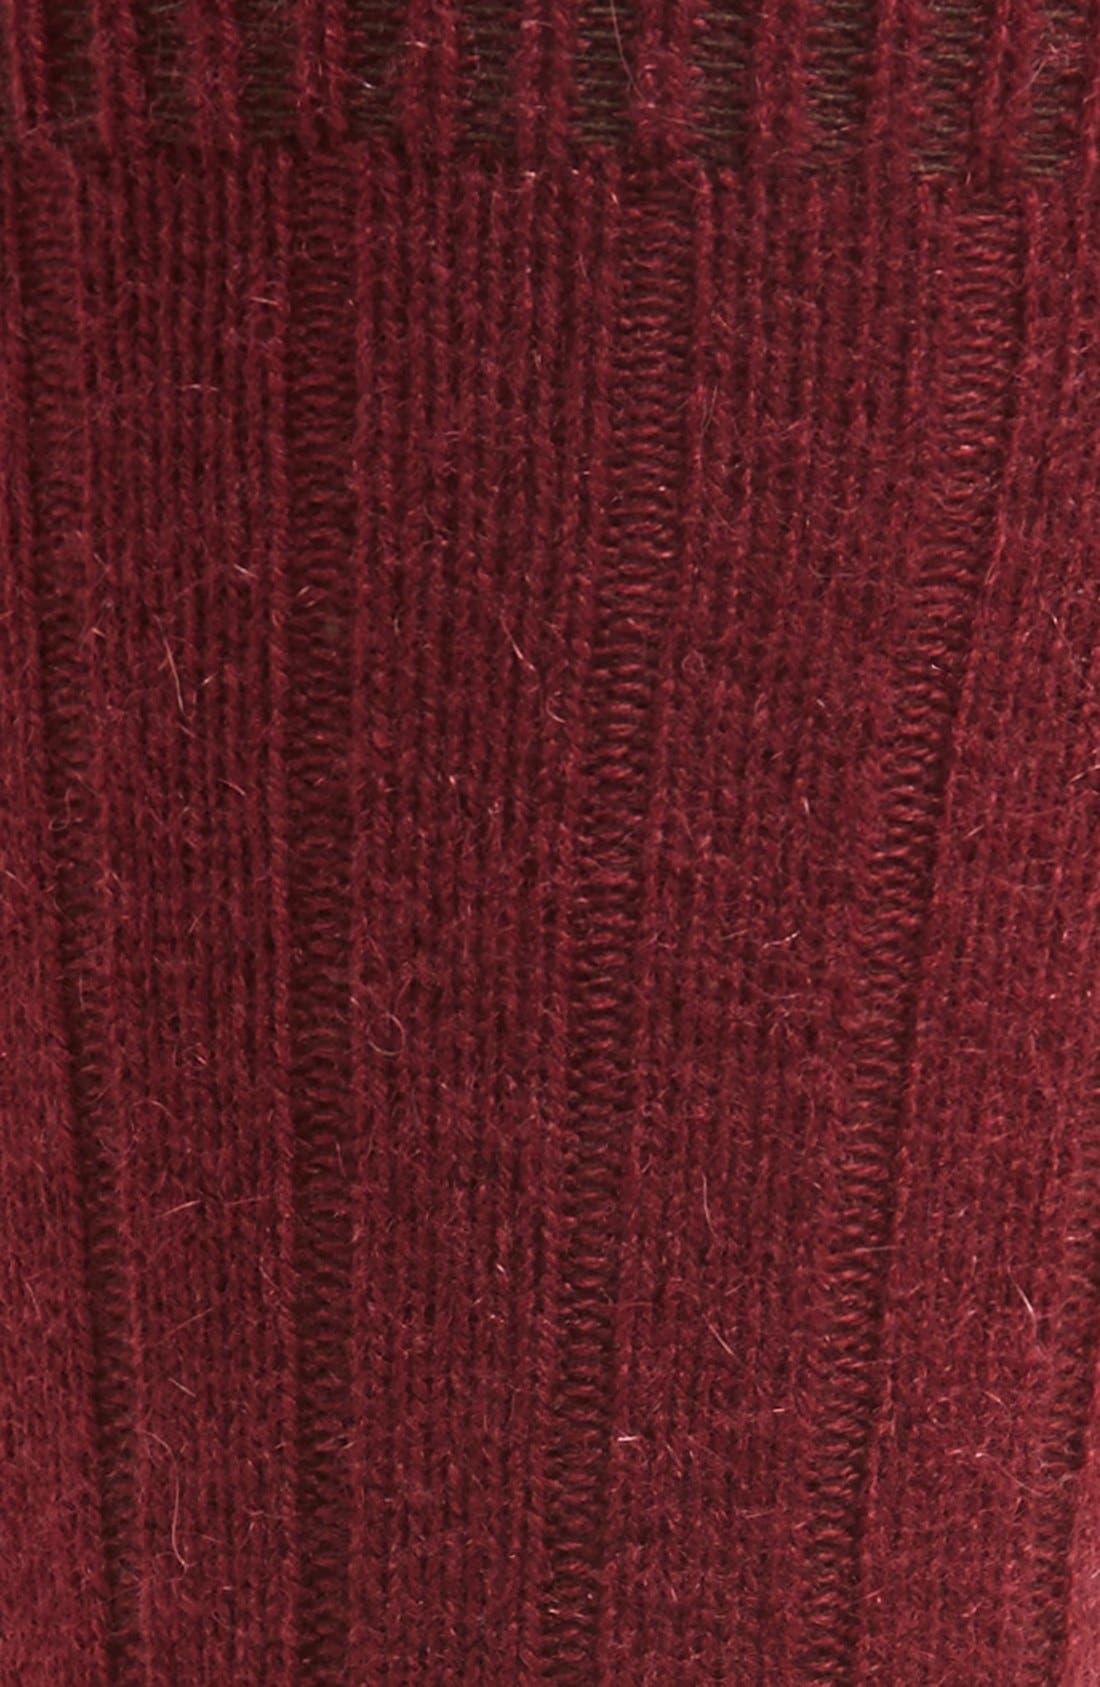 'Waddington' Cashmere Blend Mid Calf Socks,                             Alternate thumbnail 22, color,